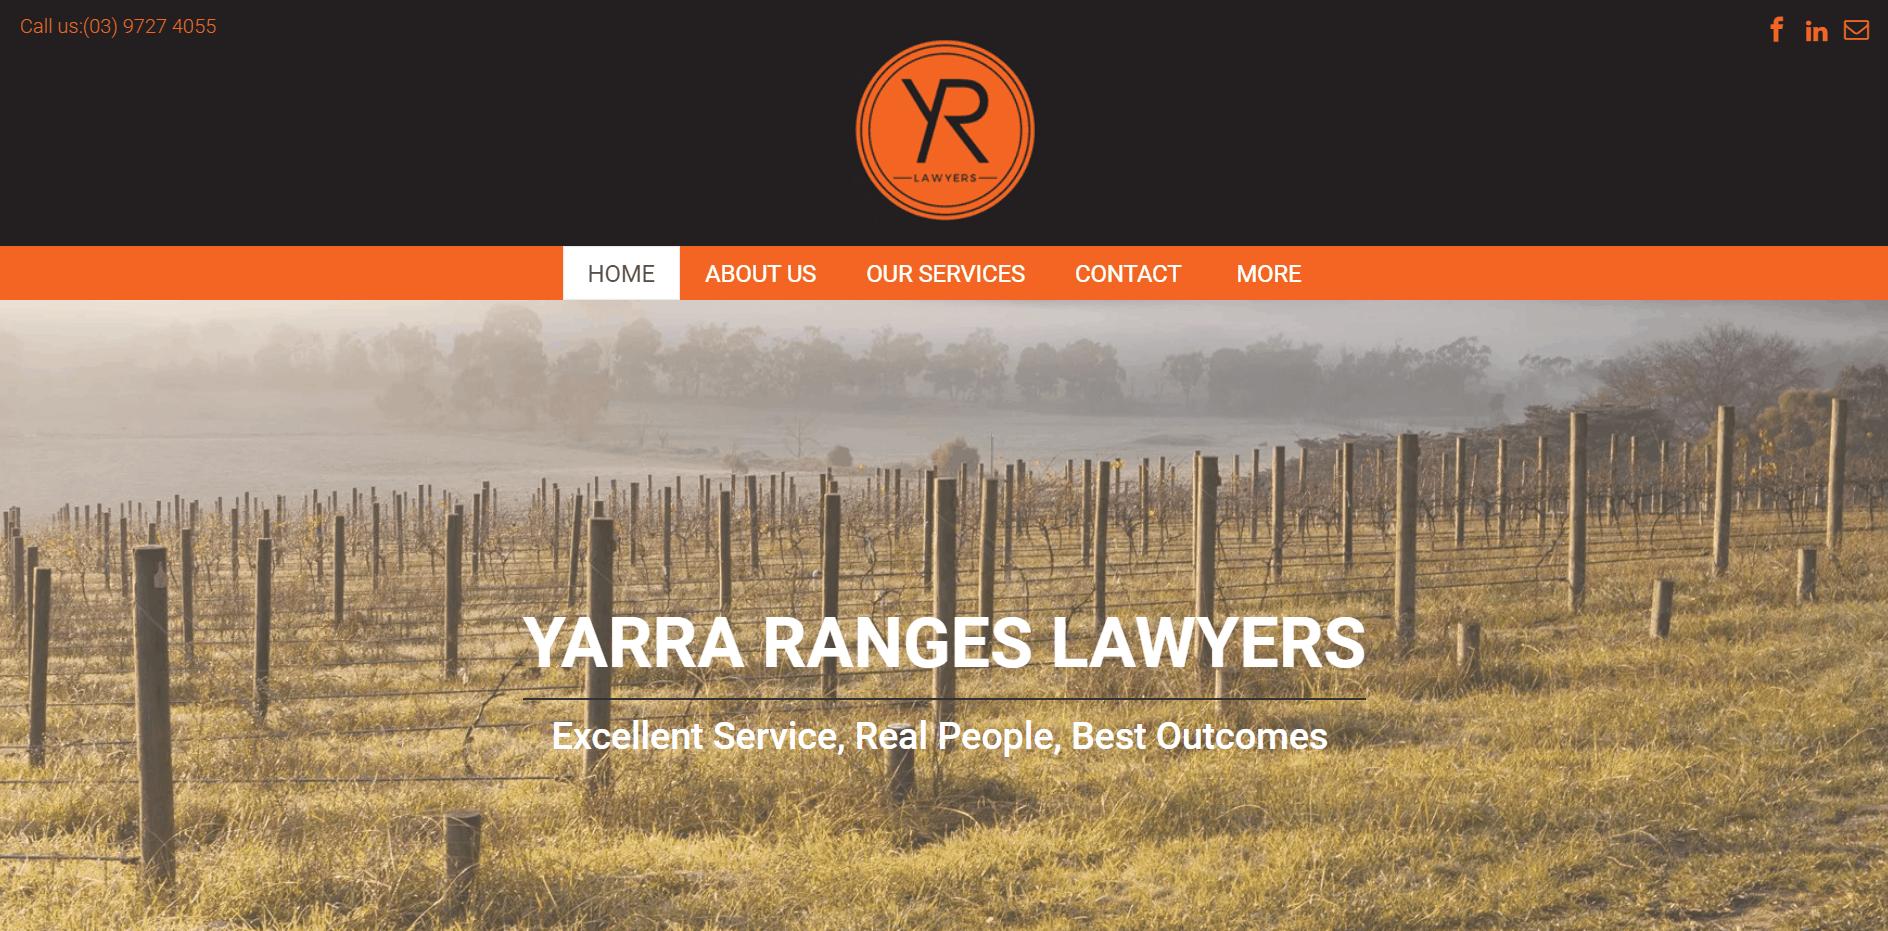 Yarra Ranges Lawyers